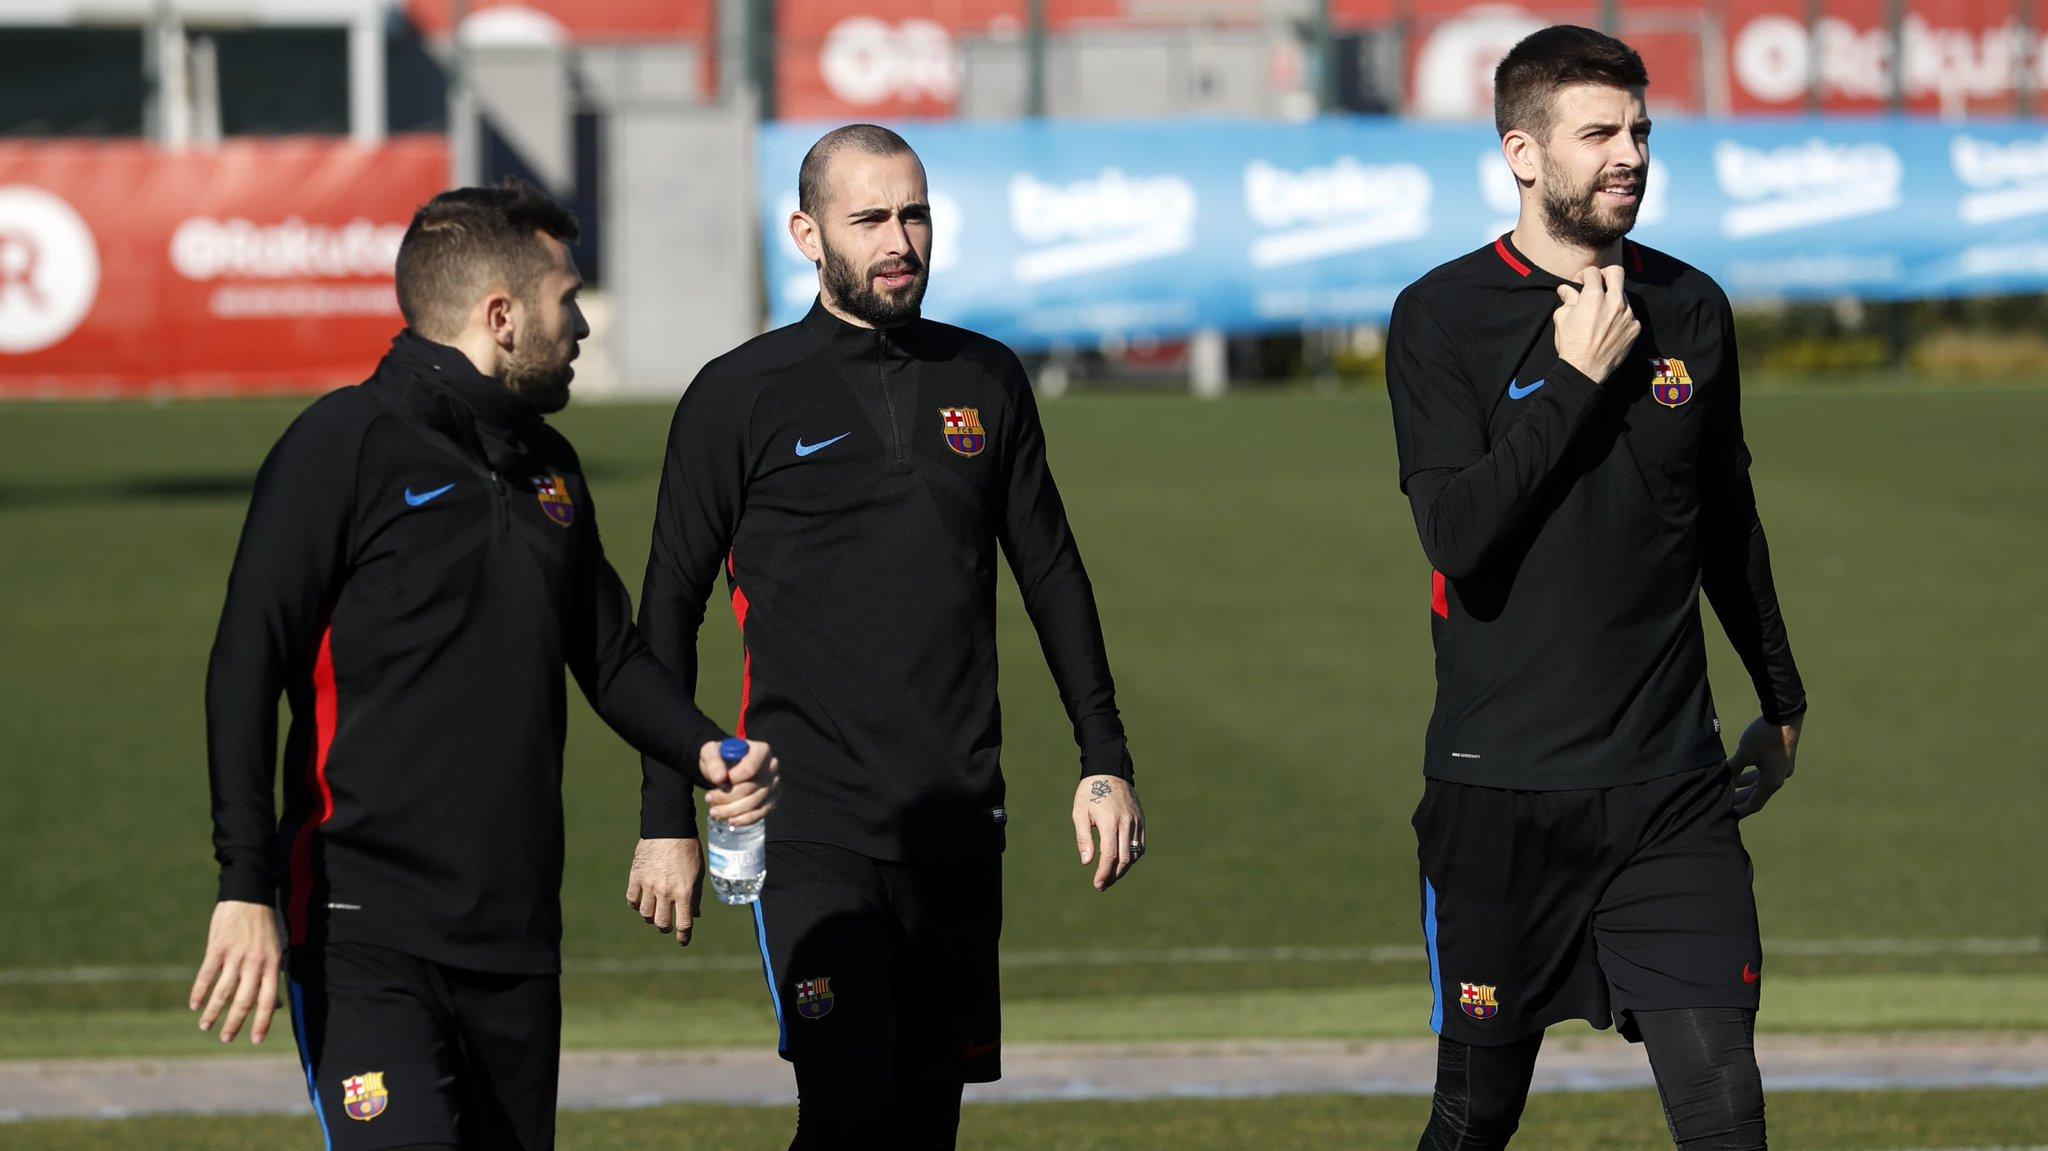 ��♂️⚽️ Our #CopaBarça preparations begin... https://t.co/G0keMOKyy9